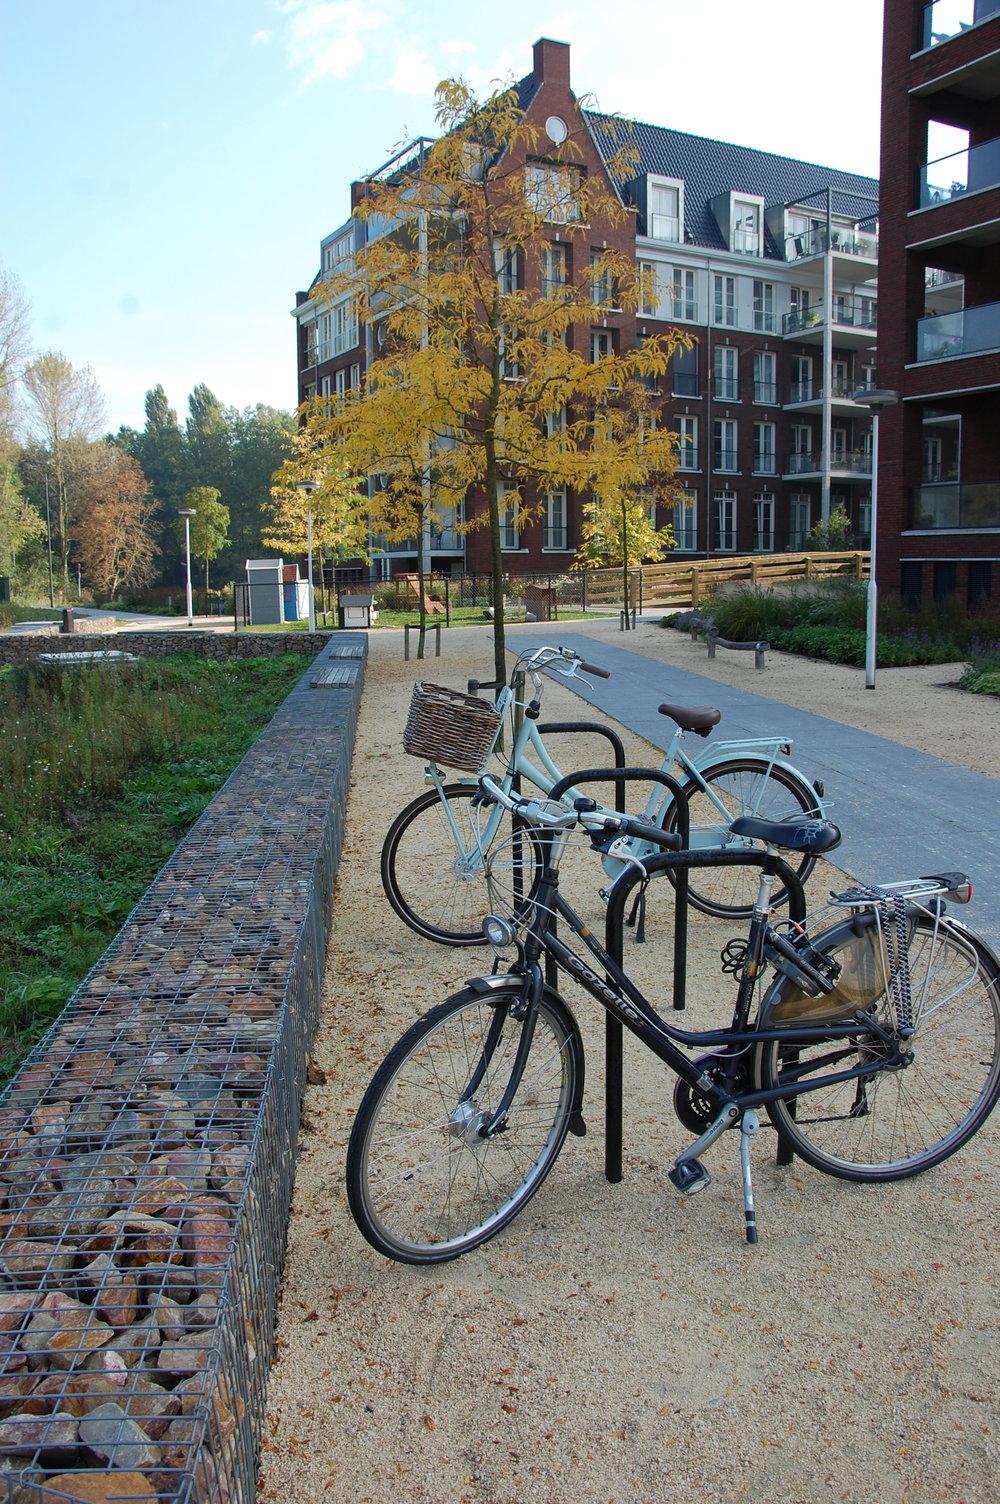 fietsenstalling bij entree park leyhoeve tilburg